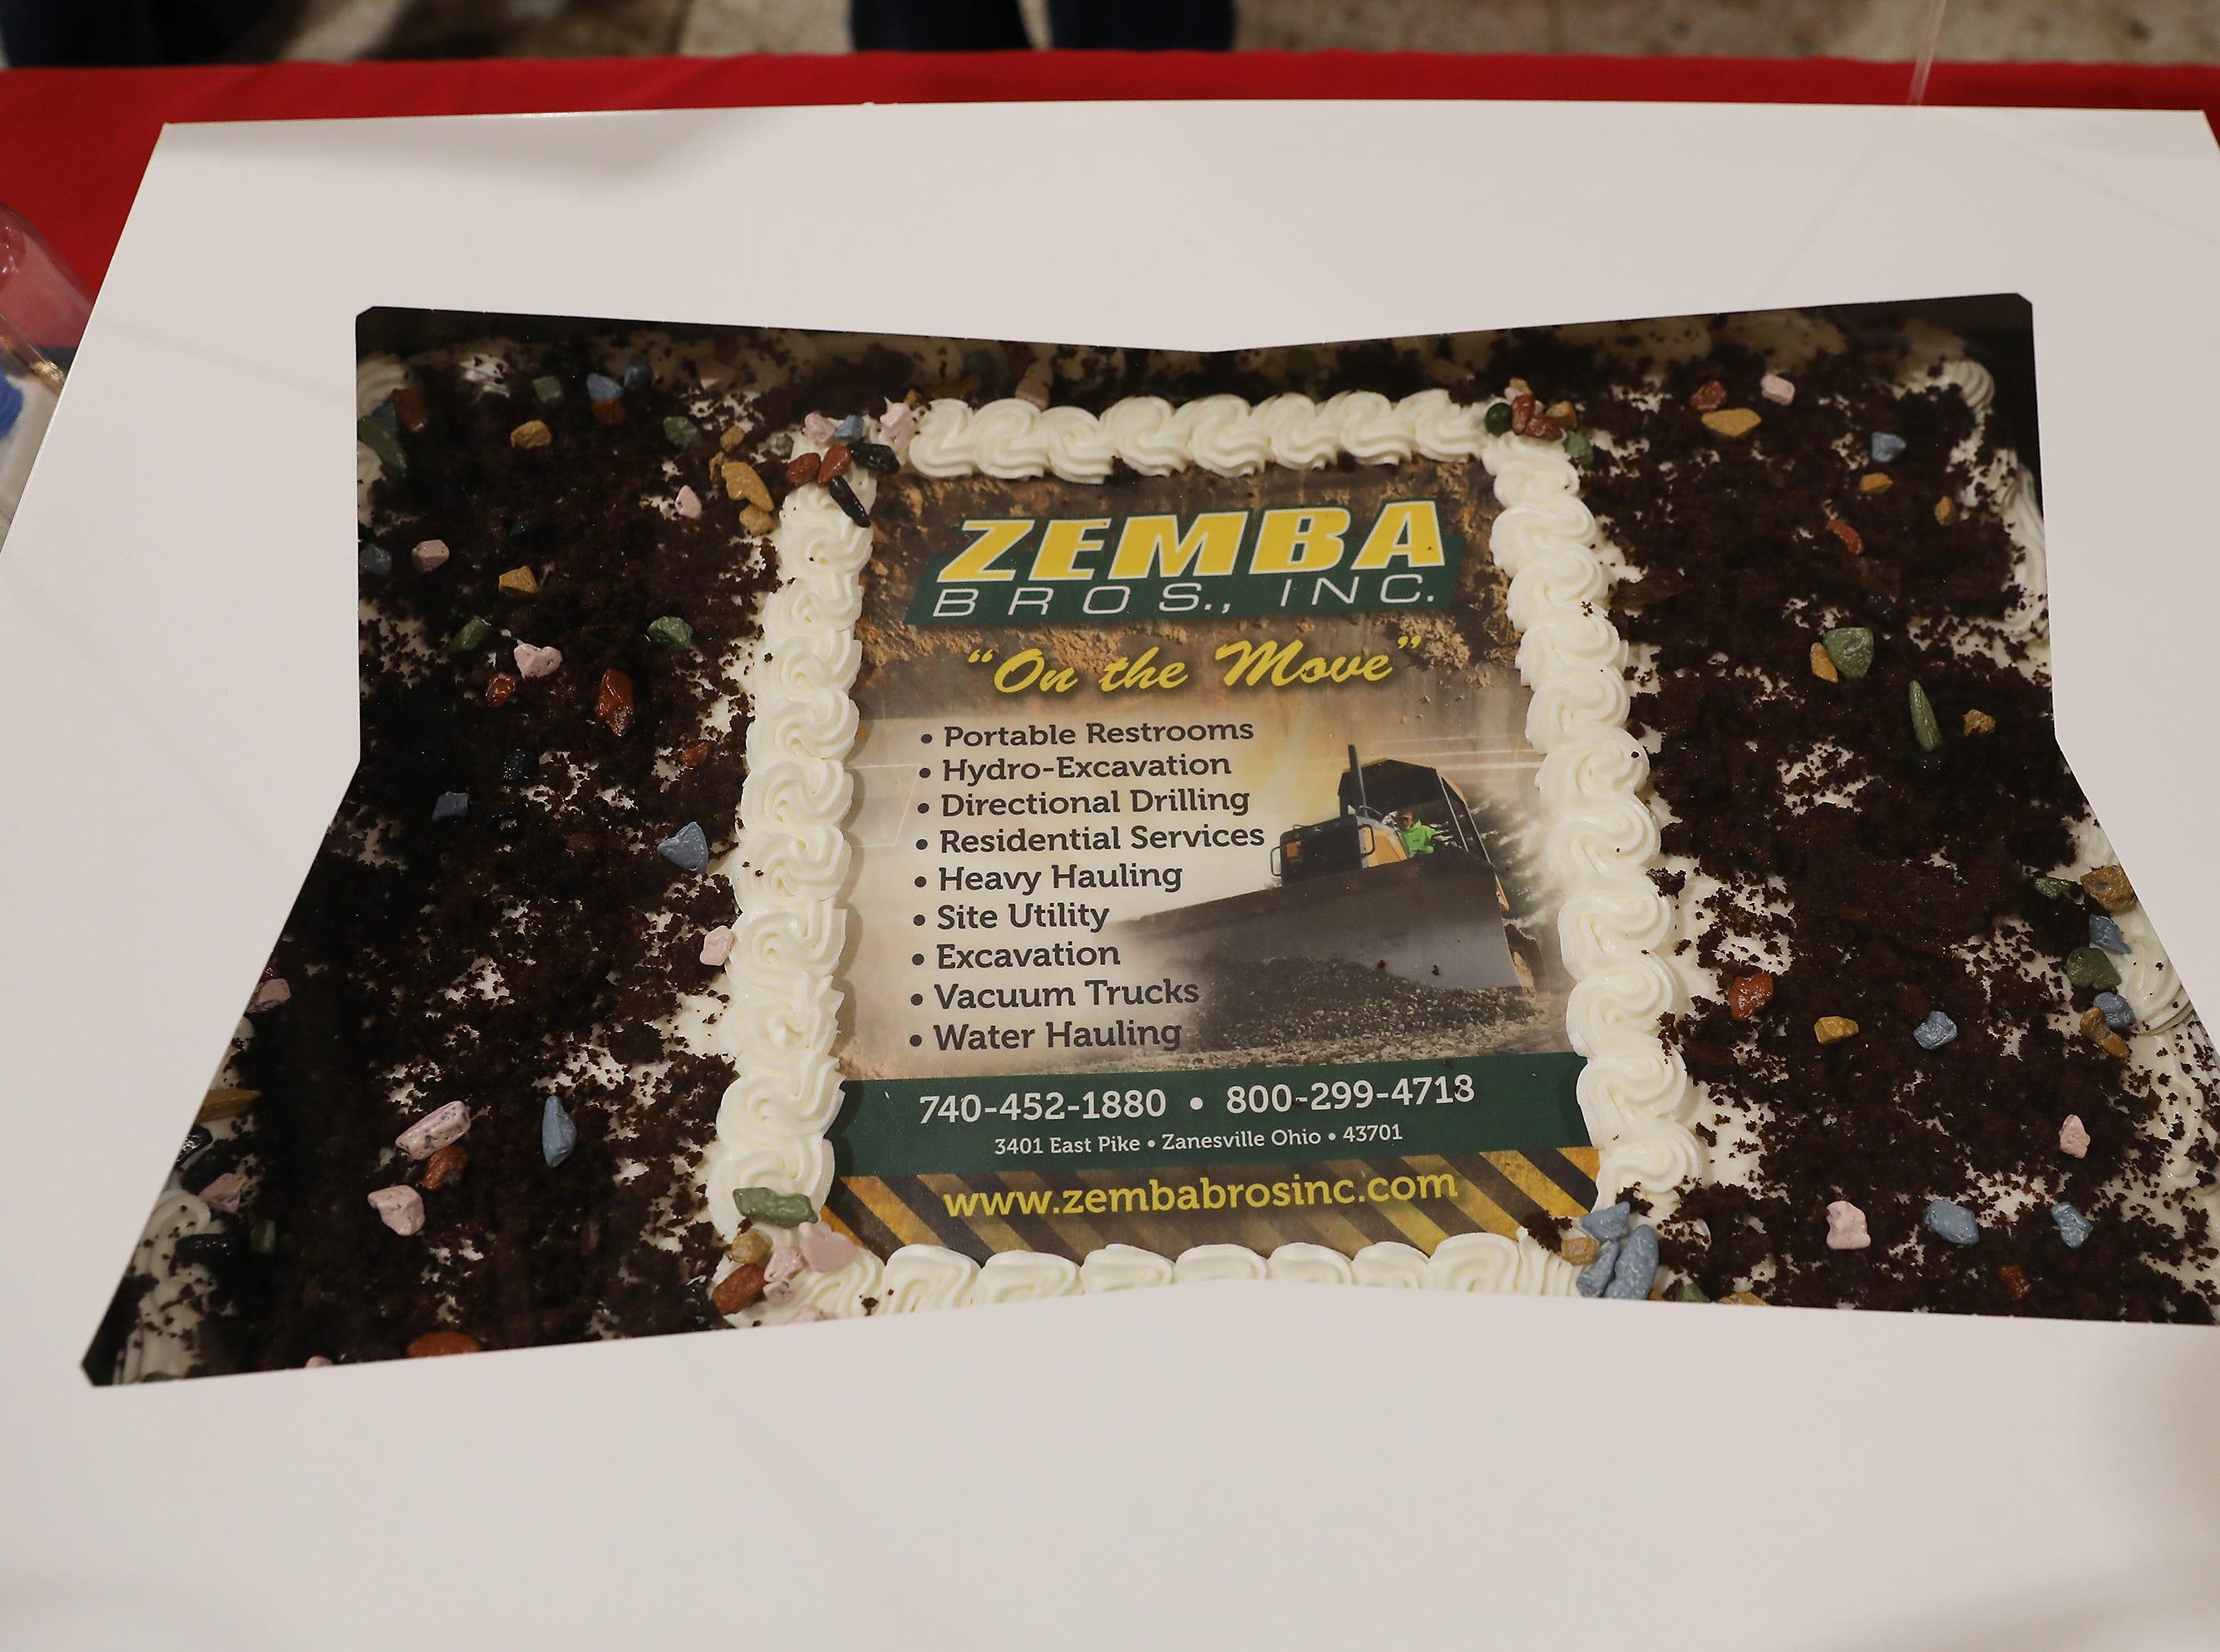 5:30 P.M. Thursday cake 200 Zemba Bros. - $50 gift cards to Marathon and Target